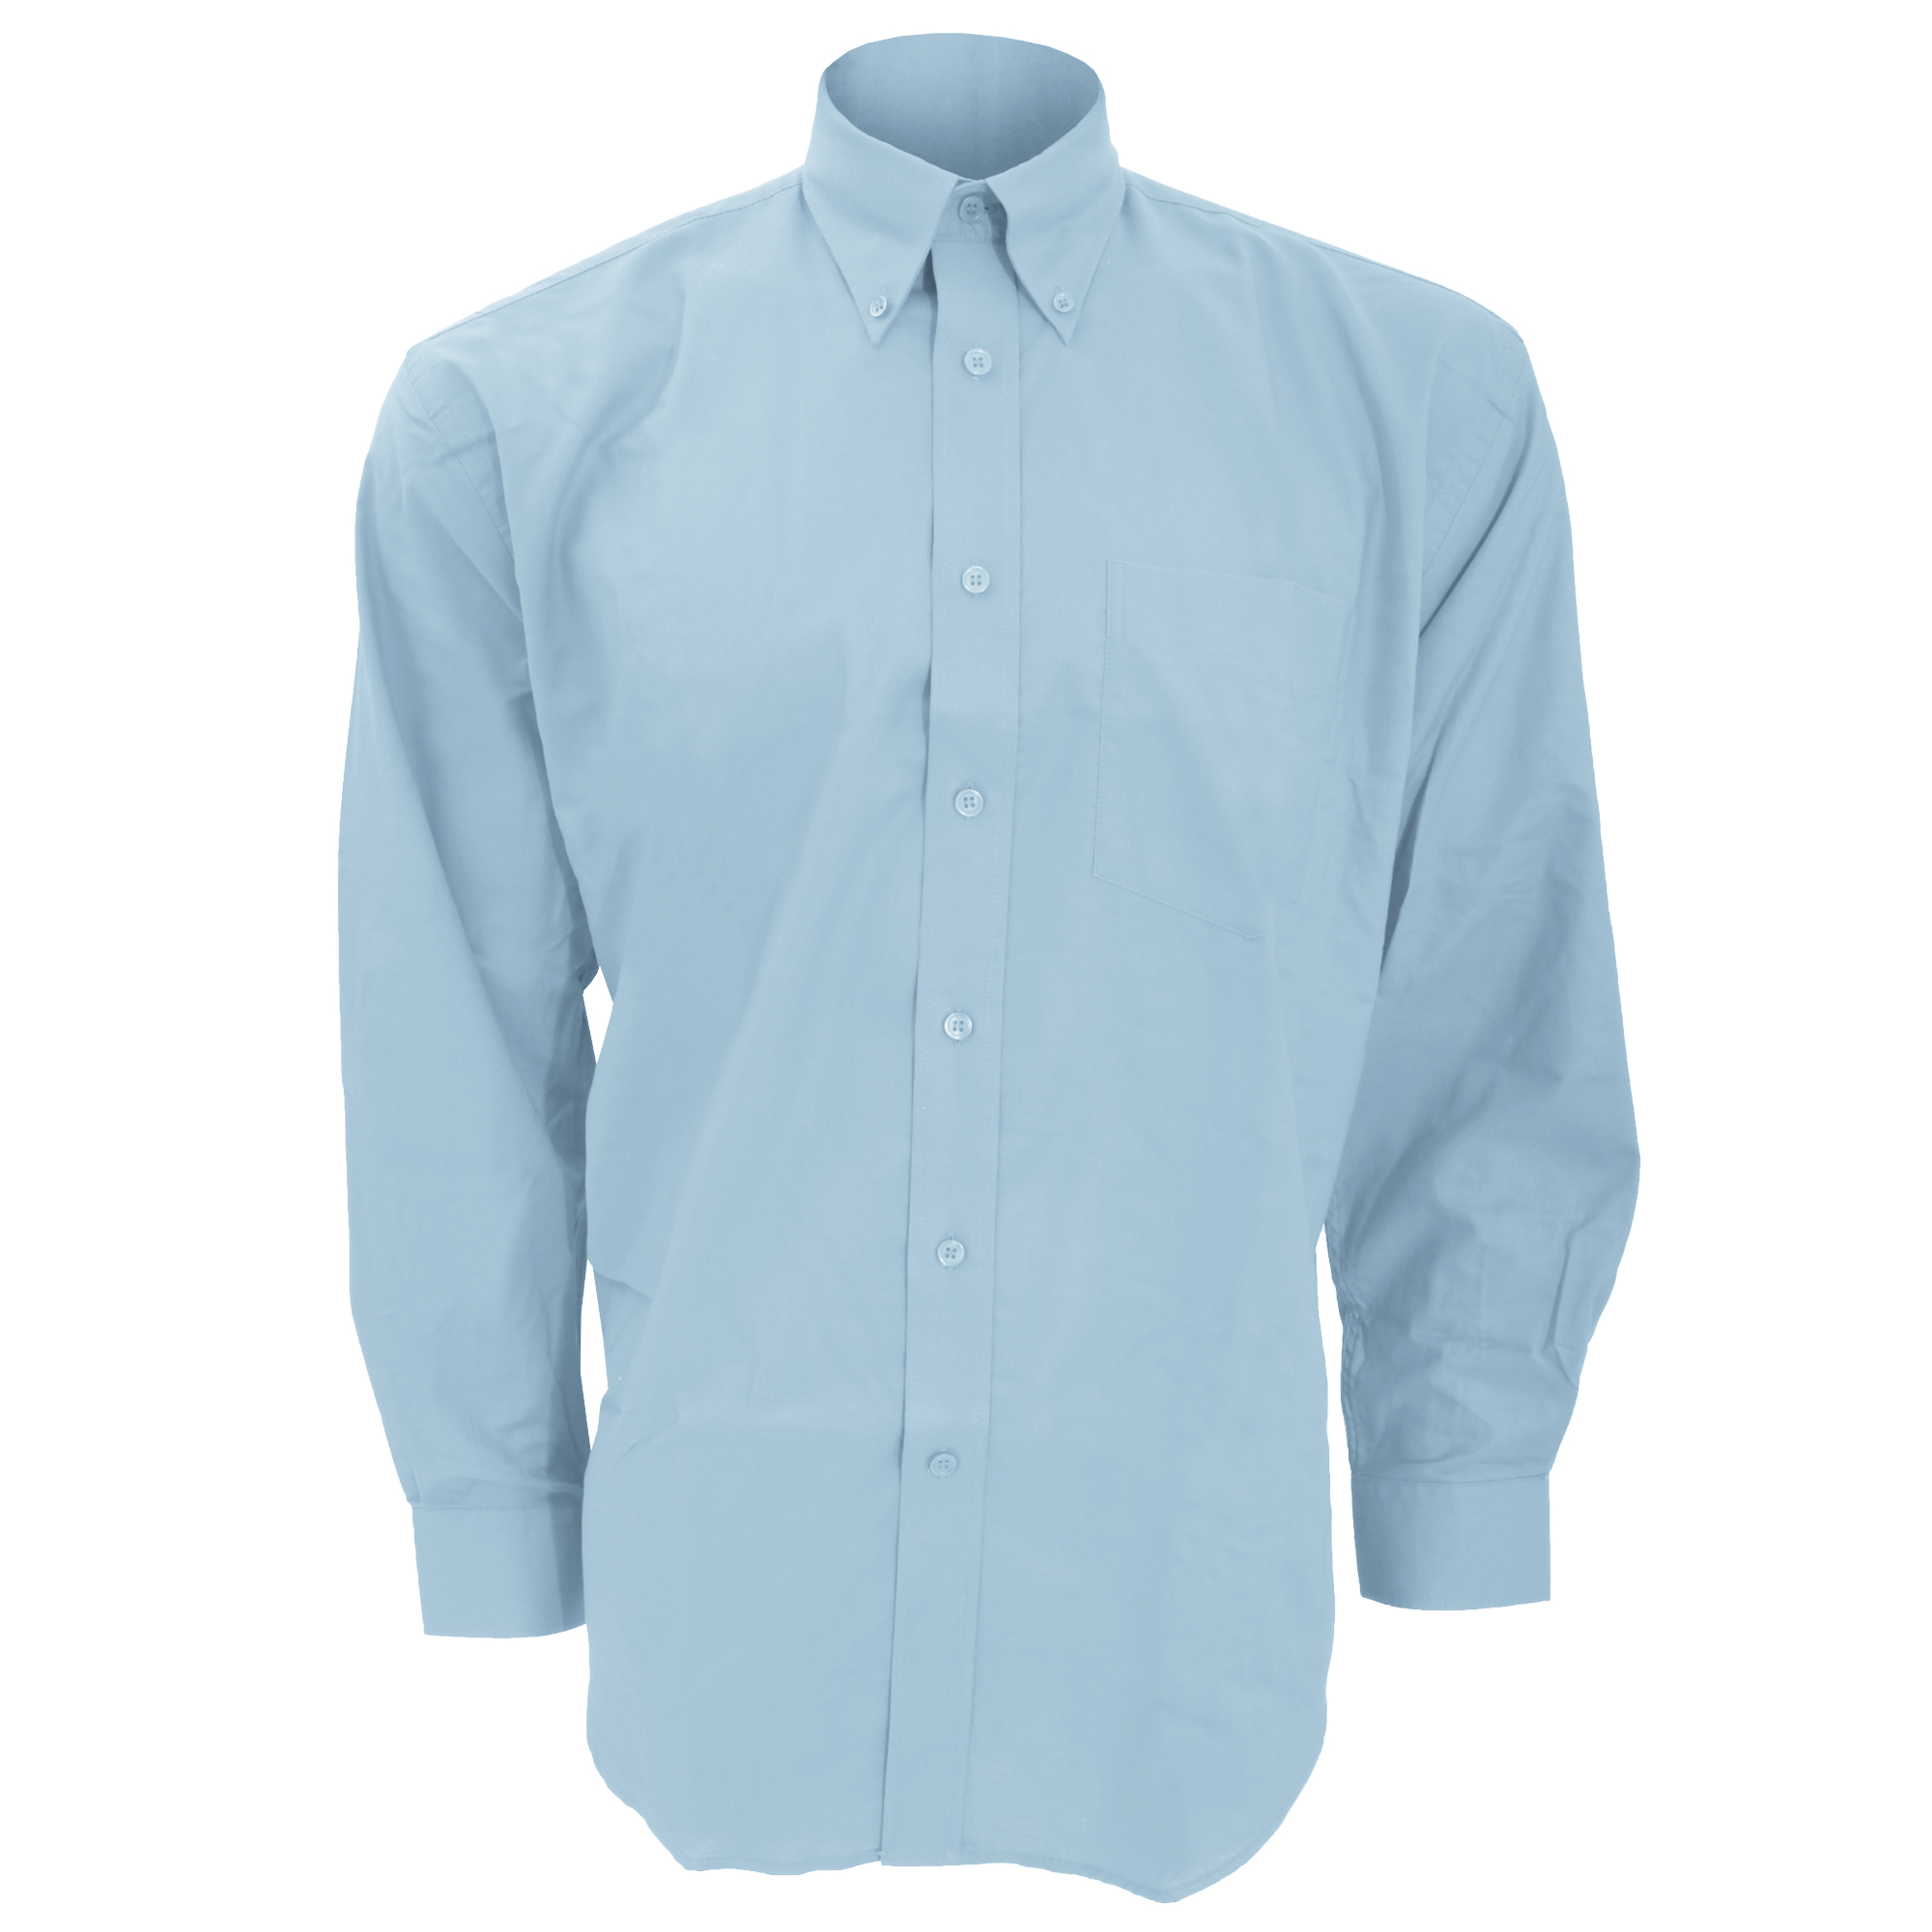 Kustom Kit Mens Workwear Oxford Long Sleeve Shirt (23inch) (Light Blue)